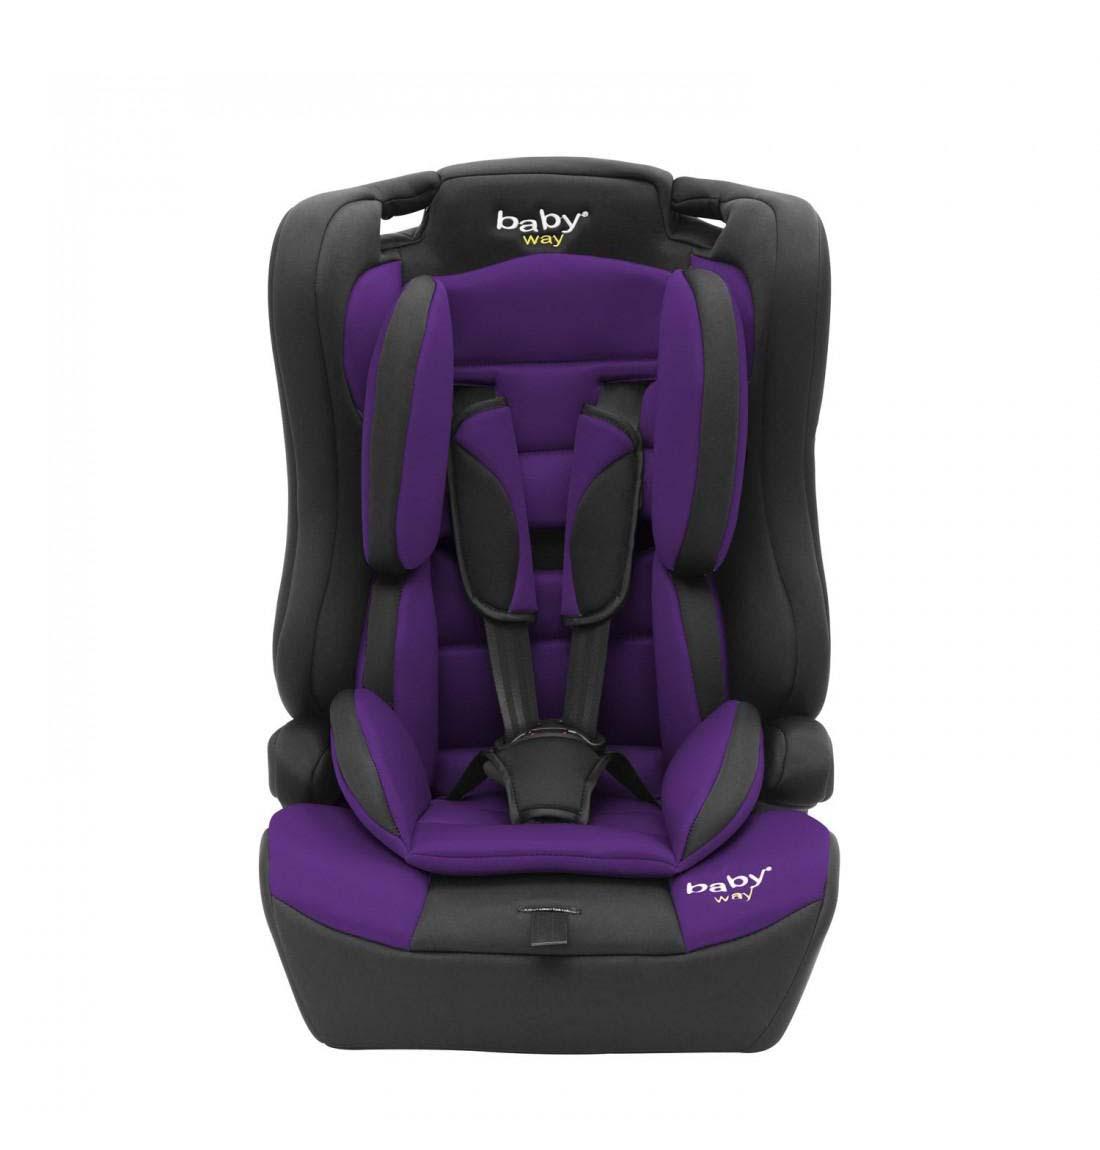 Silla De Auto Convertible Baby Way Morado Bw-746M18